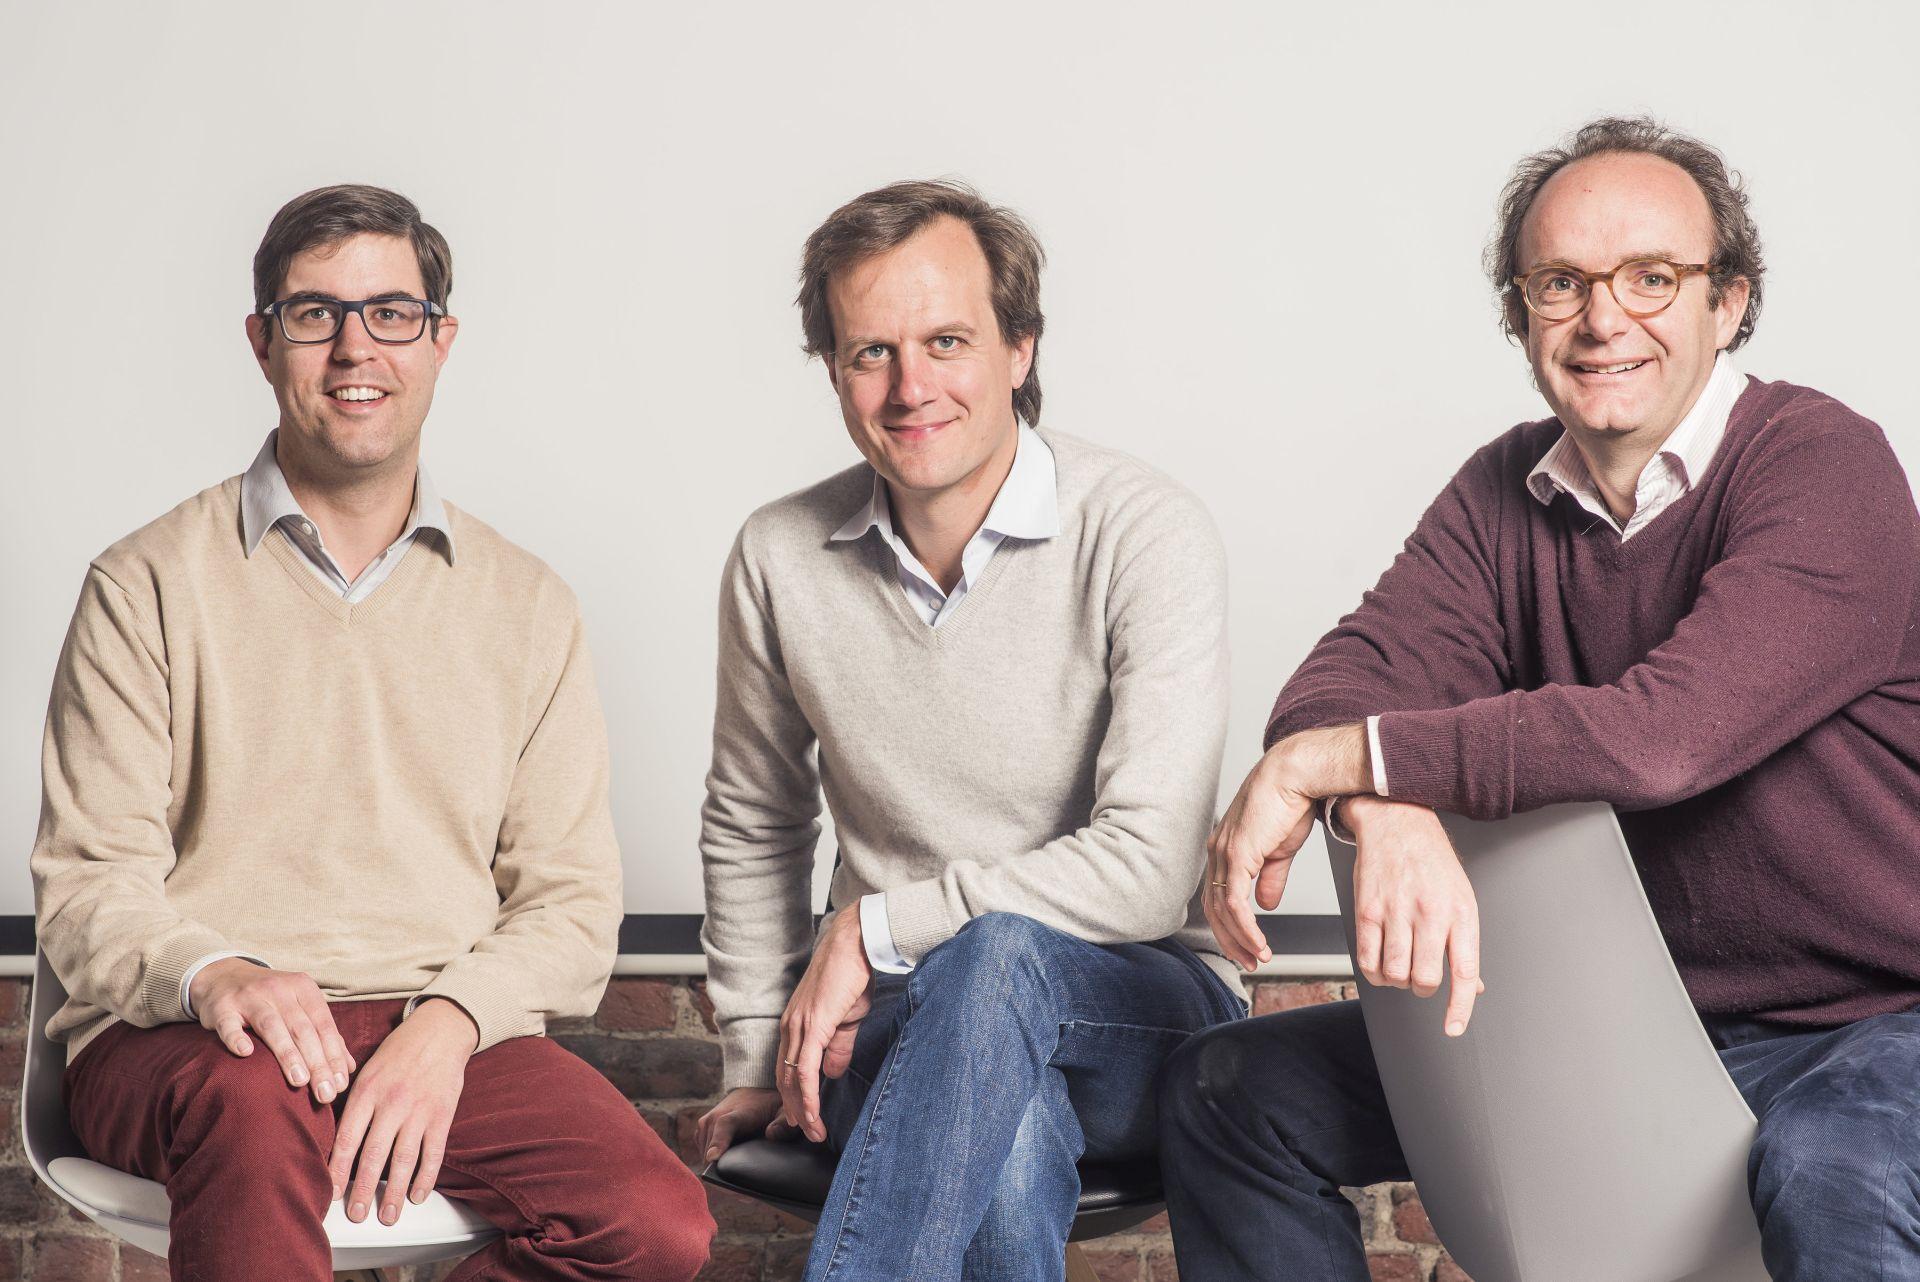 JB, Geoff and Greg